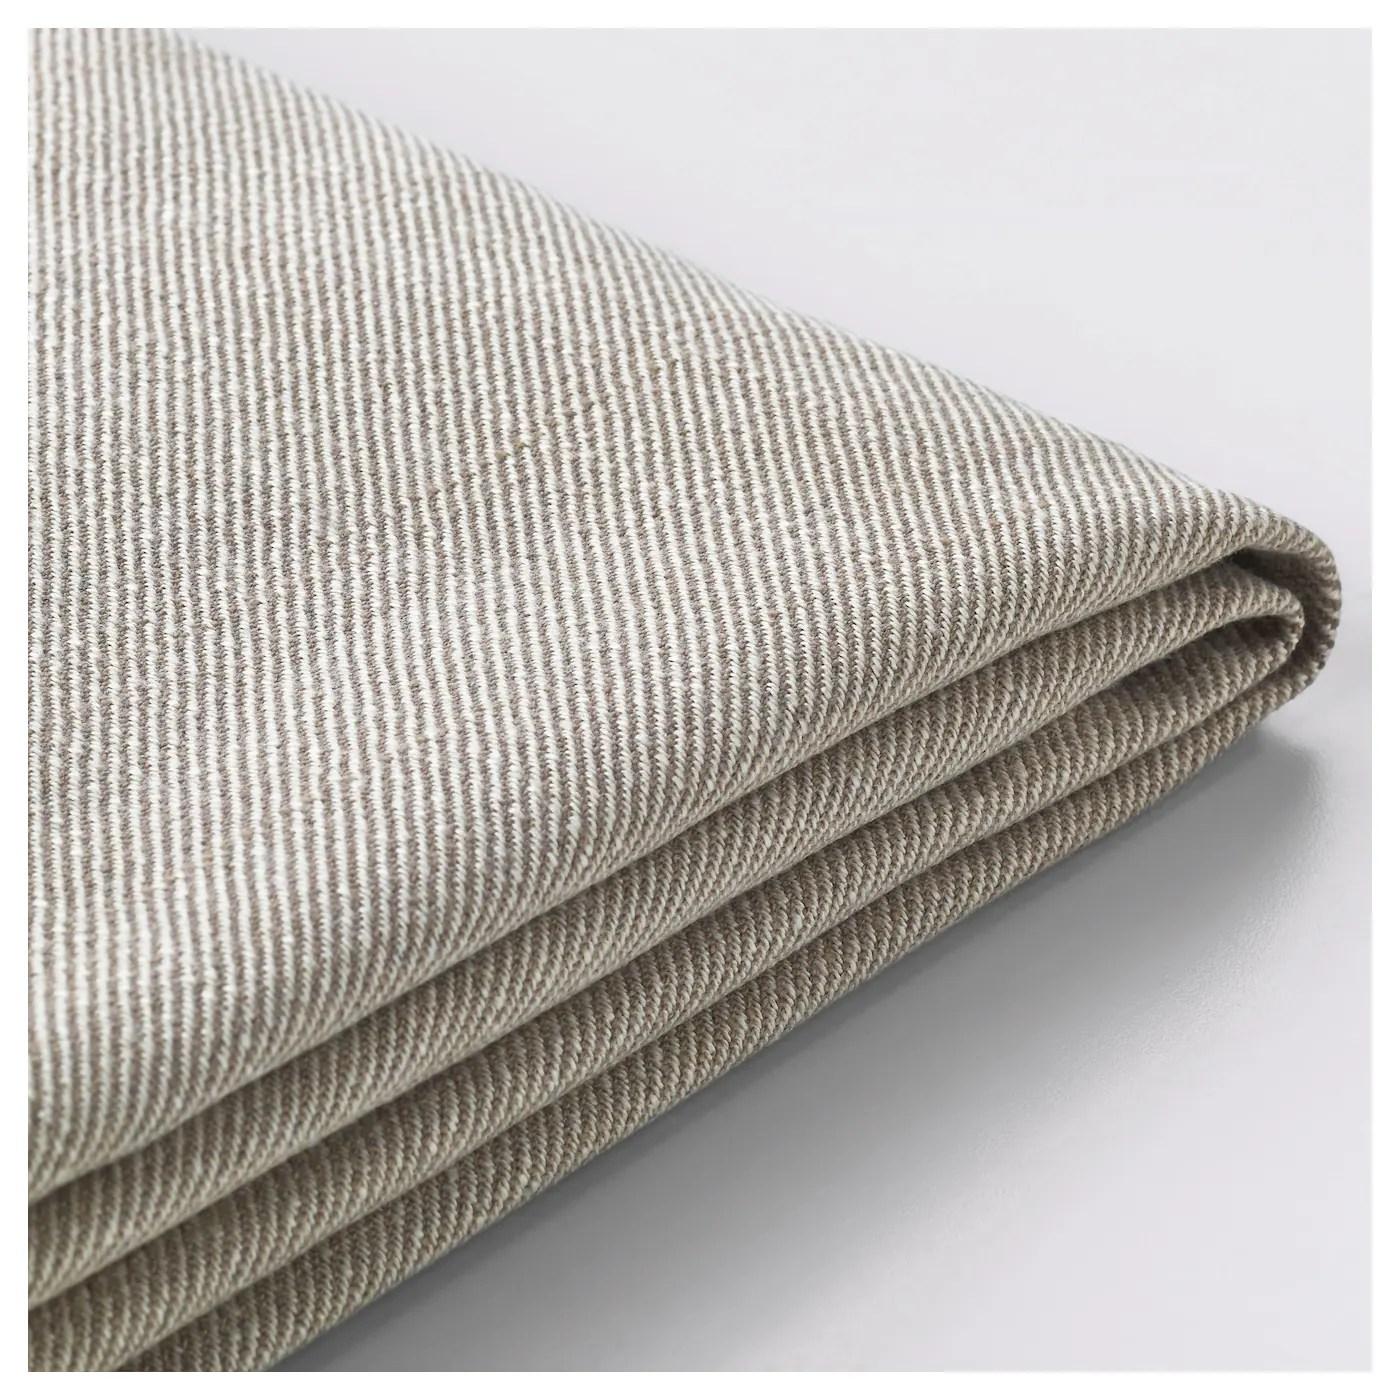 1 cover for the main frame, 1 cover for the seat cushion, 2 covers for the back cushions, and 2 covers for. EKTORP Cover three-seat sofa Nordvalla dark beige - IKEA